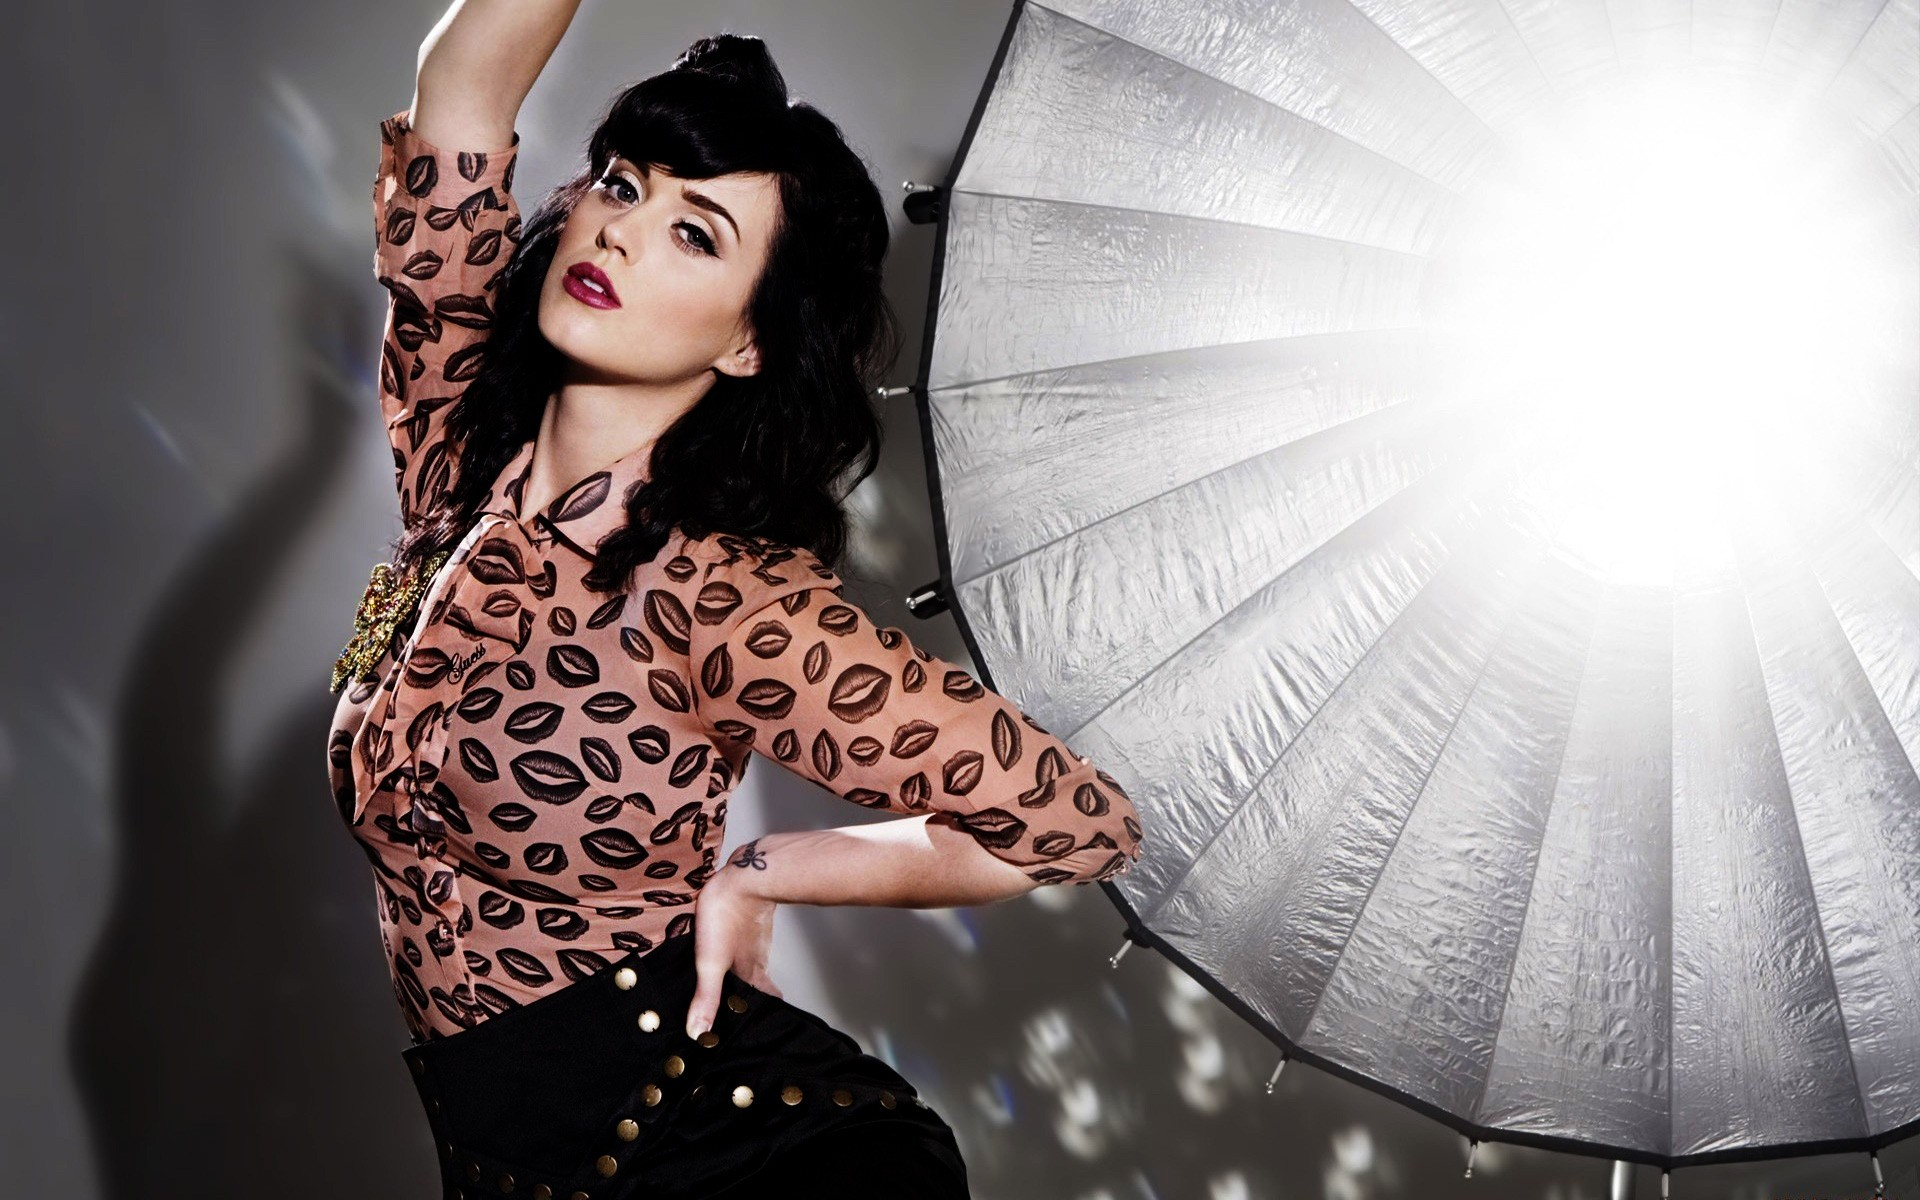 Music Fashion Woman Girl Model Portrait Beautiful Glamour - Sexy Katy Perry Wallpapers 4k - HD Wallpaper